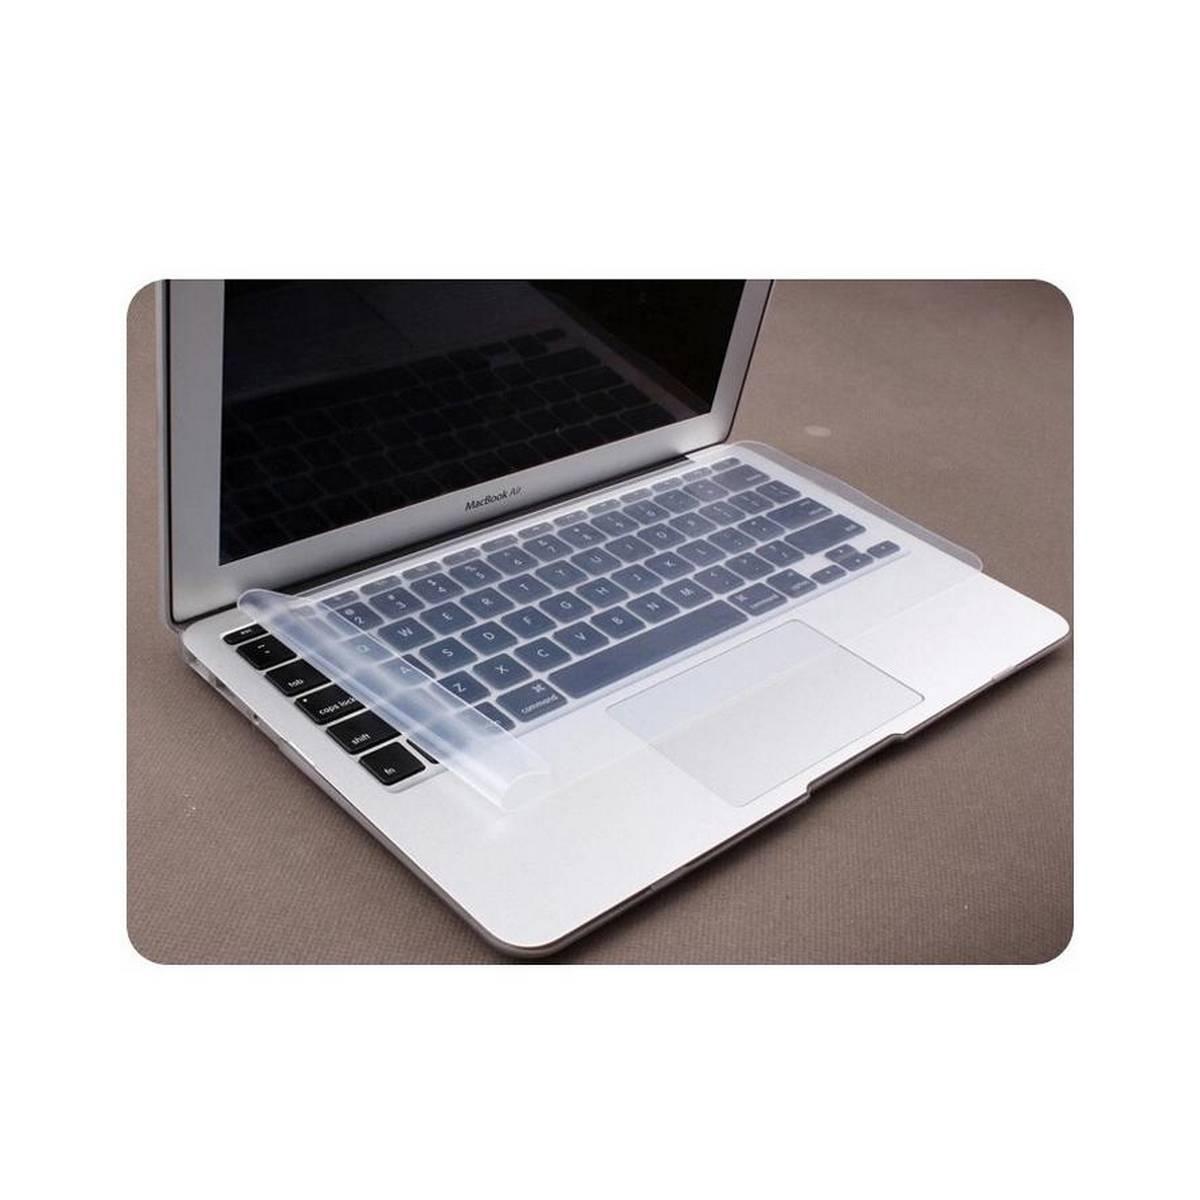 Universal Laptop Keyboard Silicone Waterproof Protector For Numpad Laptop Keybords - Transparent